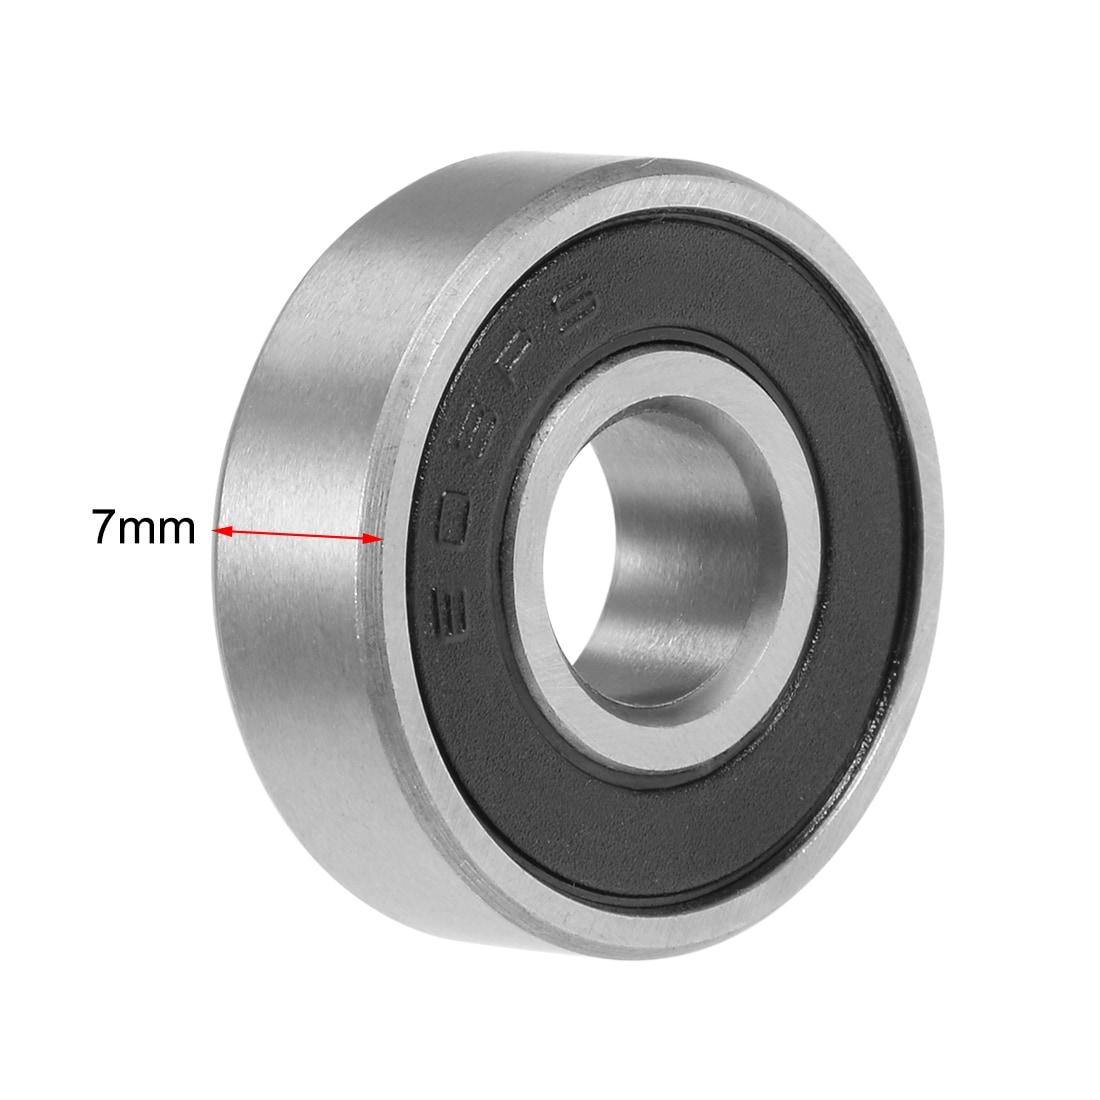 8x22x7mm 100 PCS Single-row radial ball bearing HOT!!! 608RS Rolling Bearings